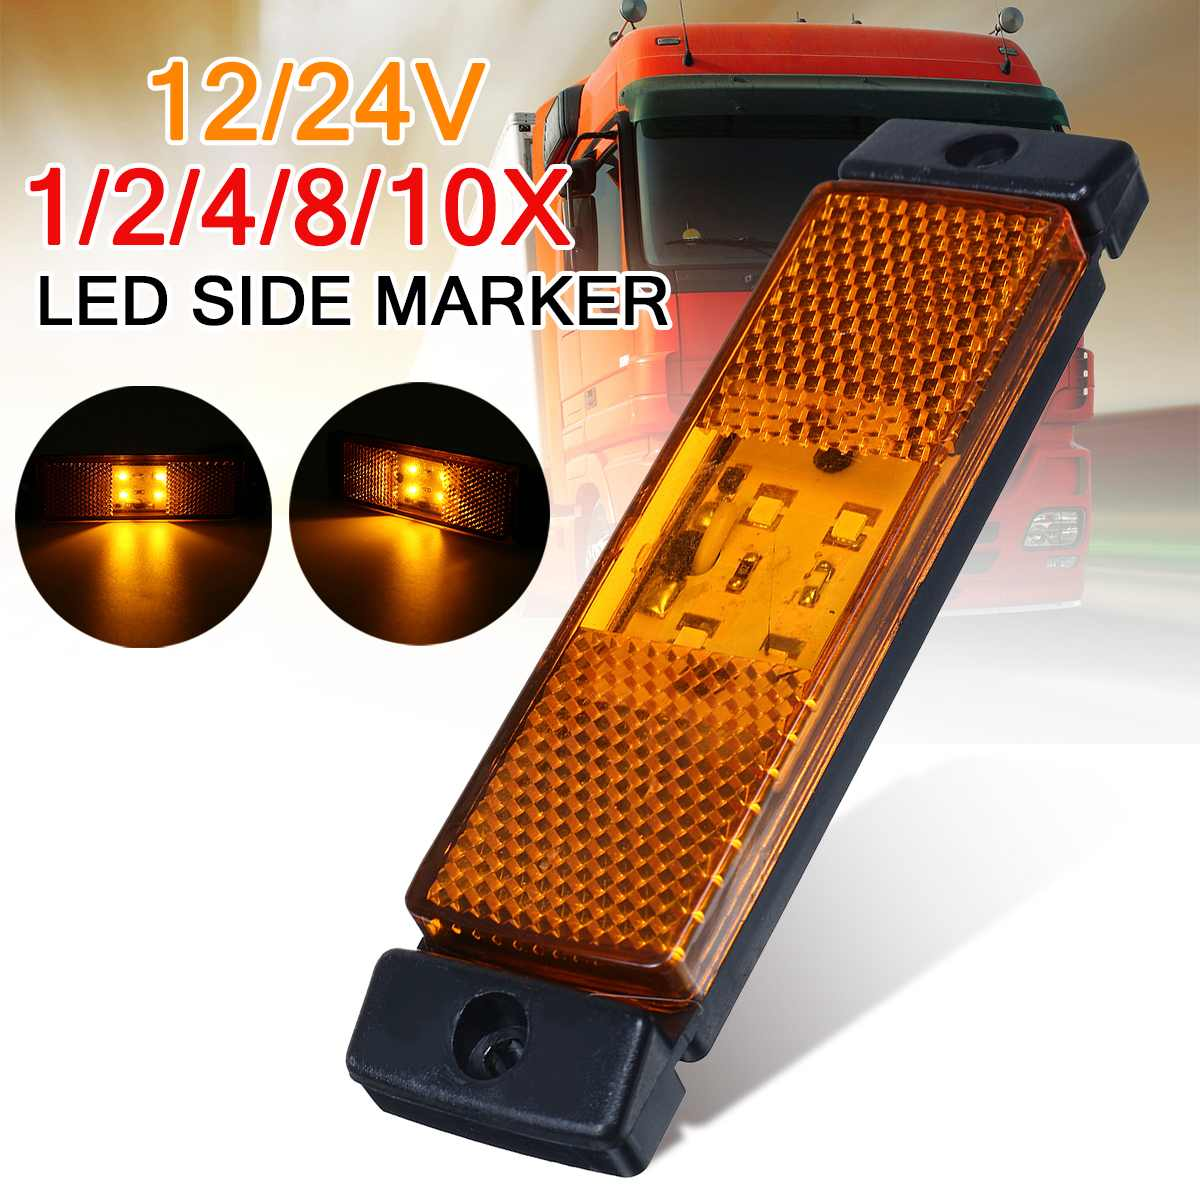 8 X 4LED Lights Trailer Truck Lorries Indicator Light Amber Lamp Side Marker 24V